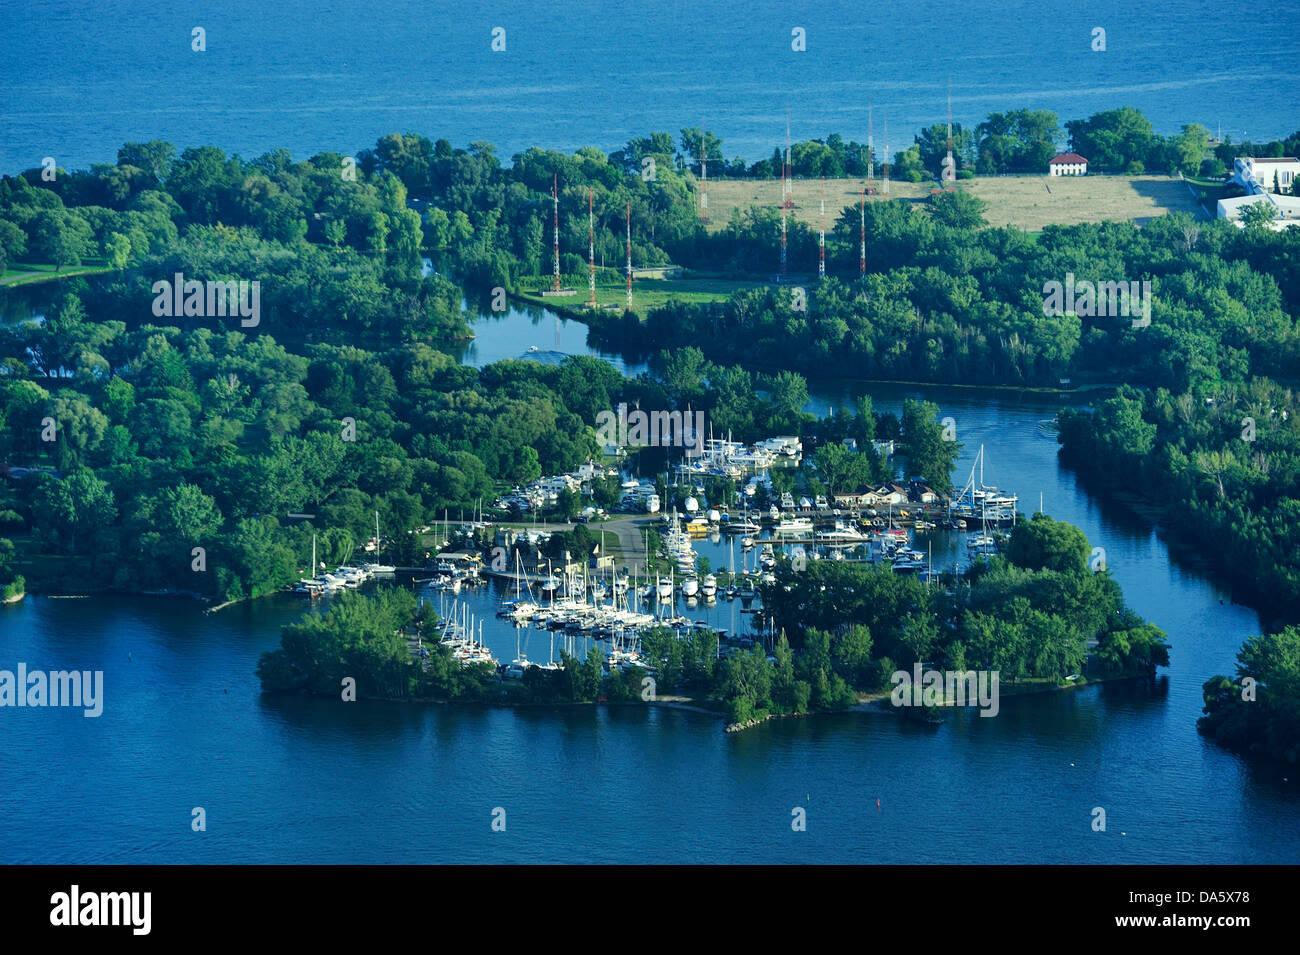 Toronto Island Park, Lake Ontario, Ontario, Canada, Park, lake, forest - Stock Image